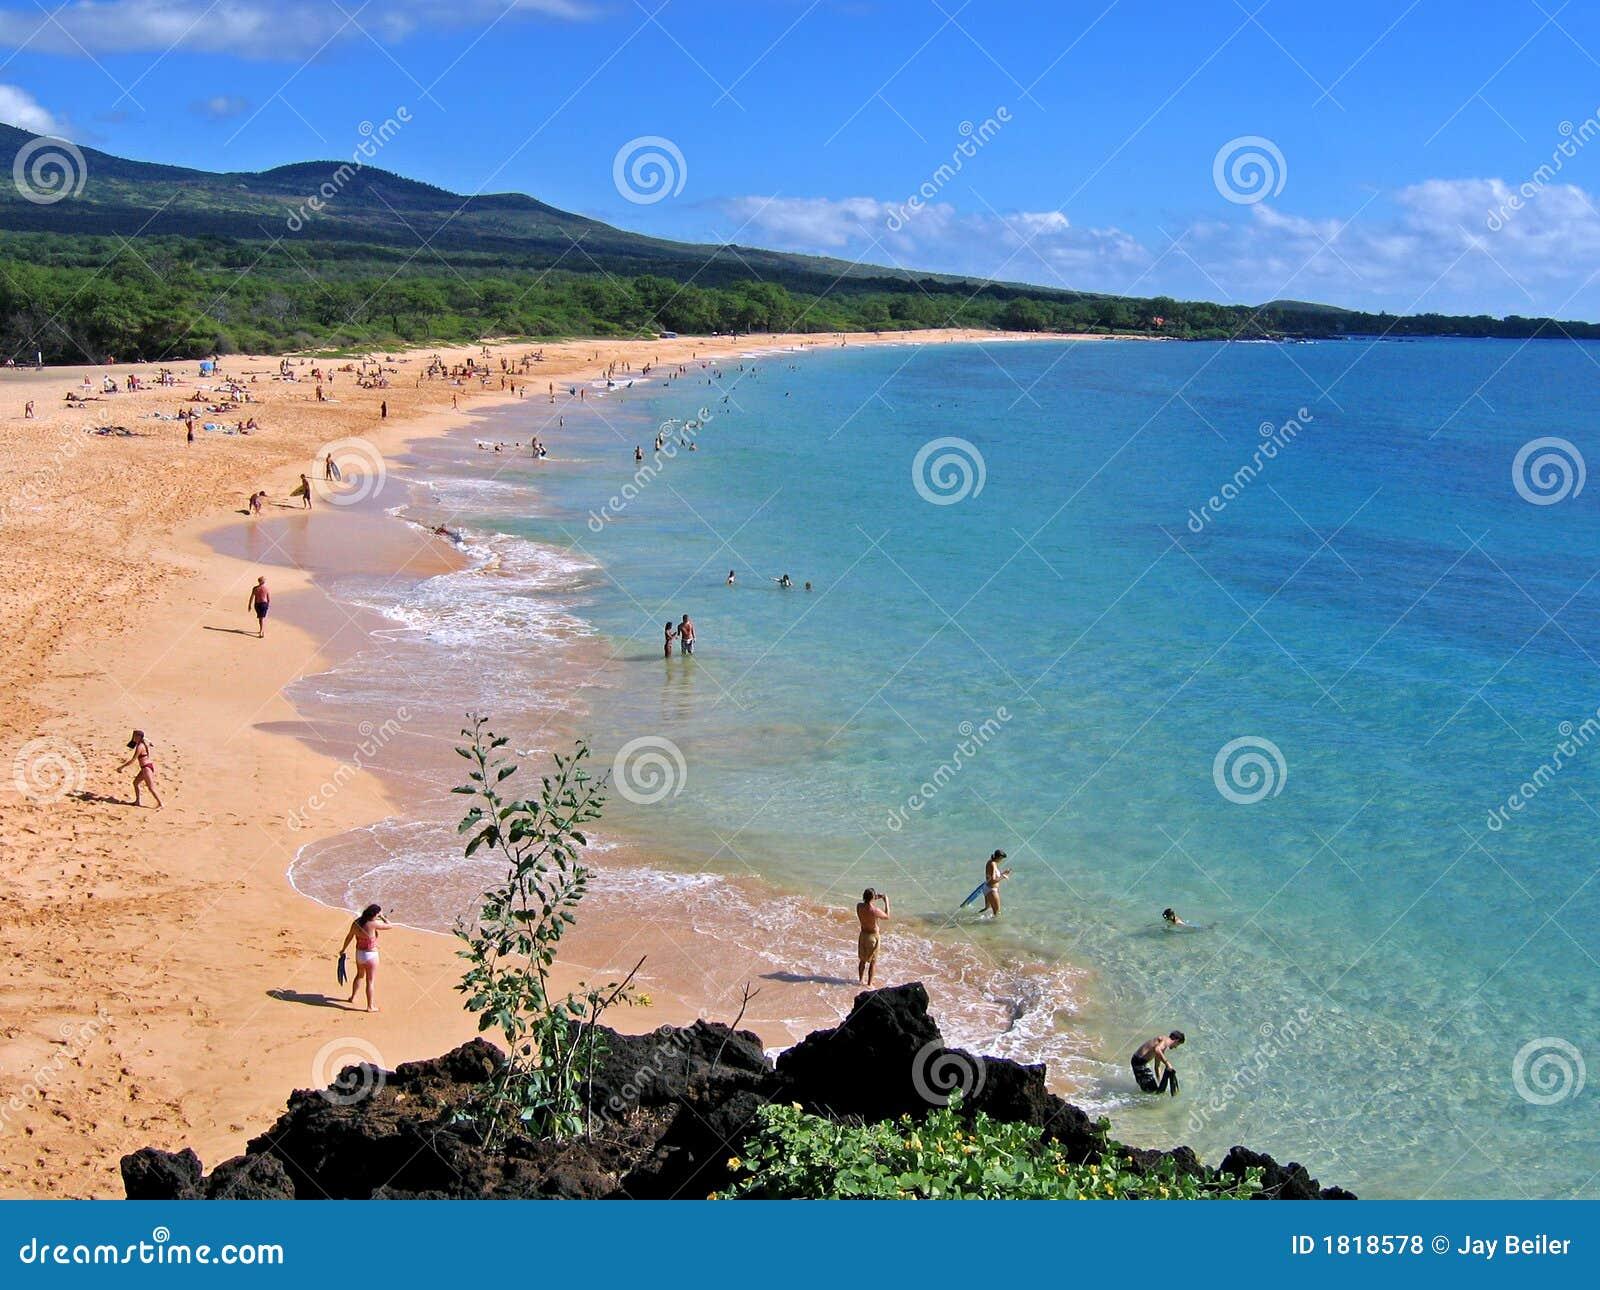 Big Beach, Makena, Maui, Hawaii Royalty Free Stock Photos - Image ...